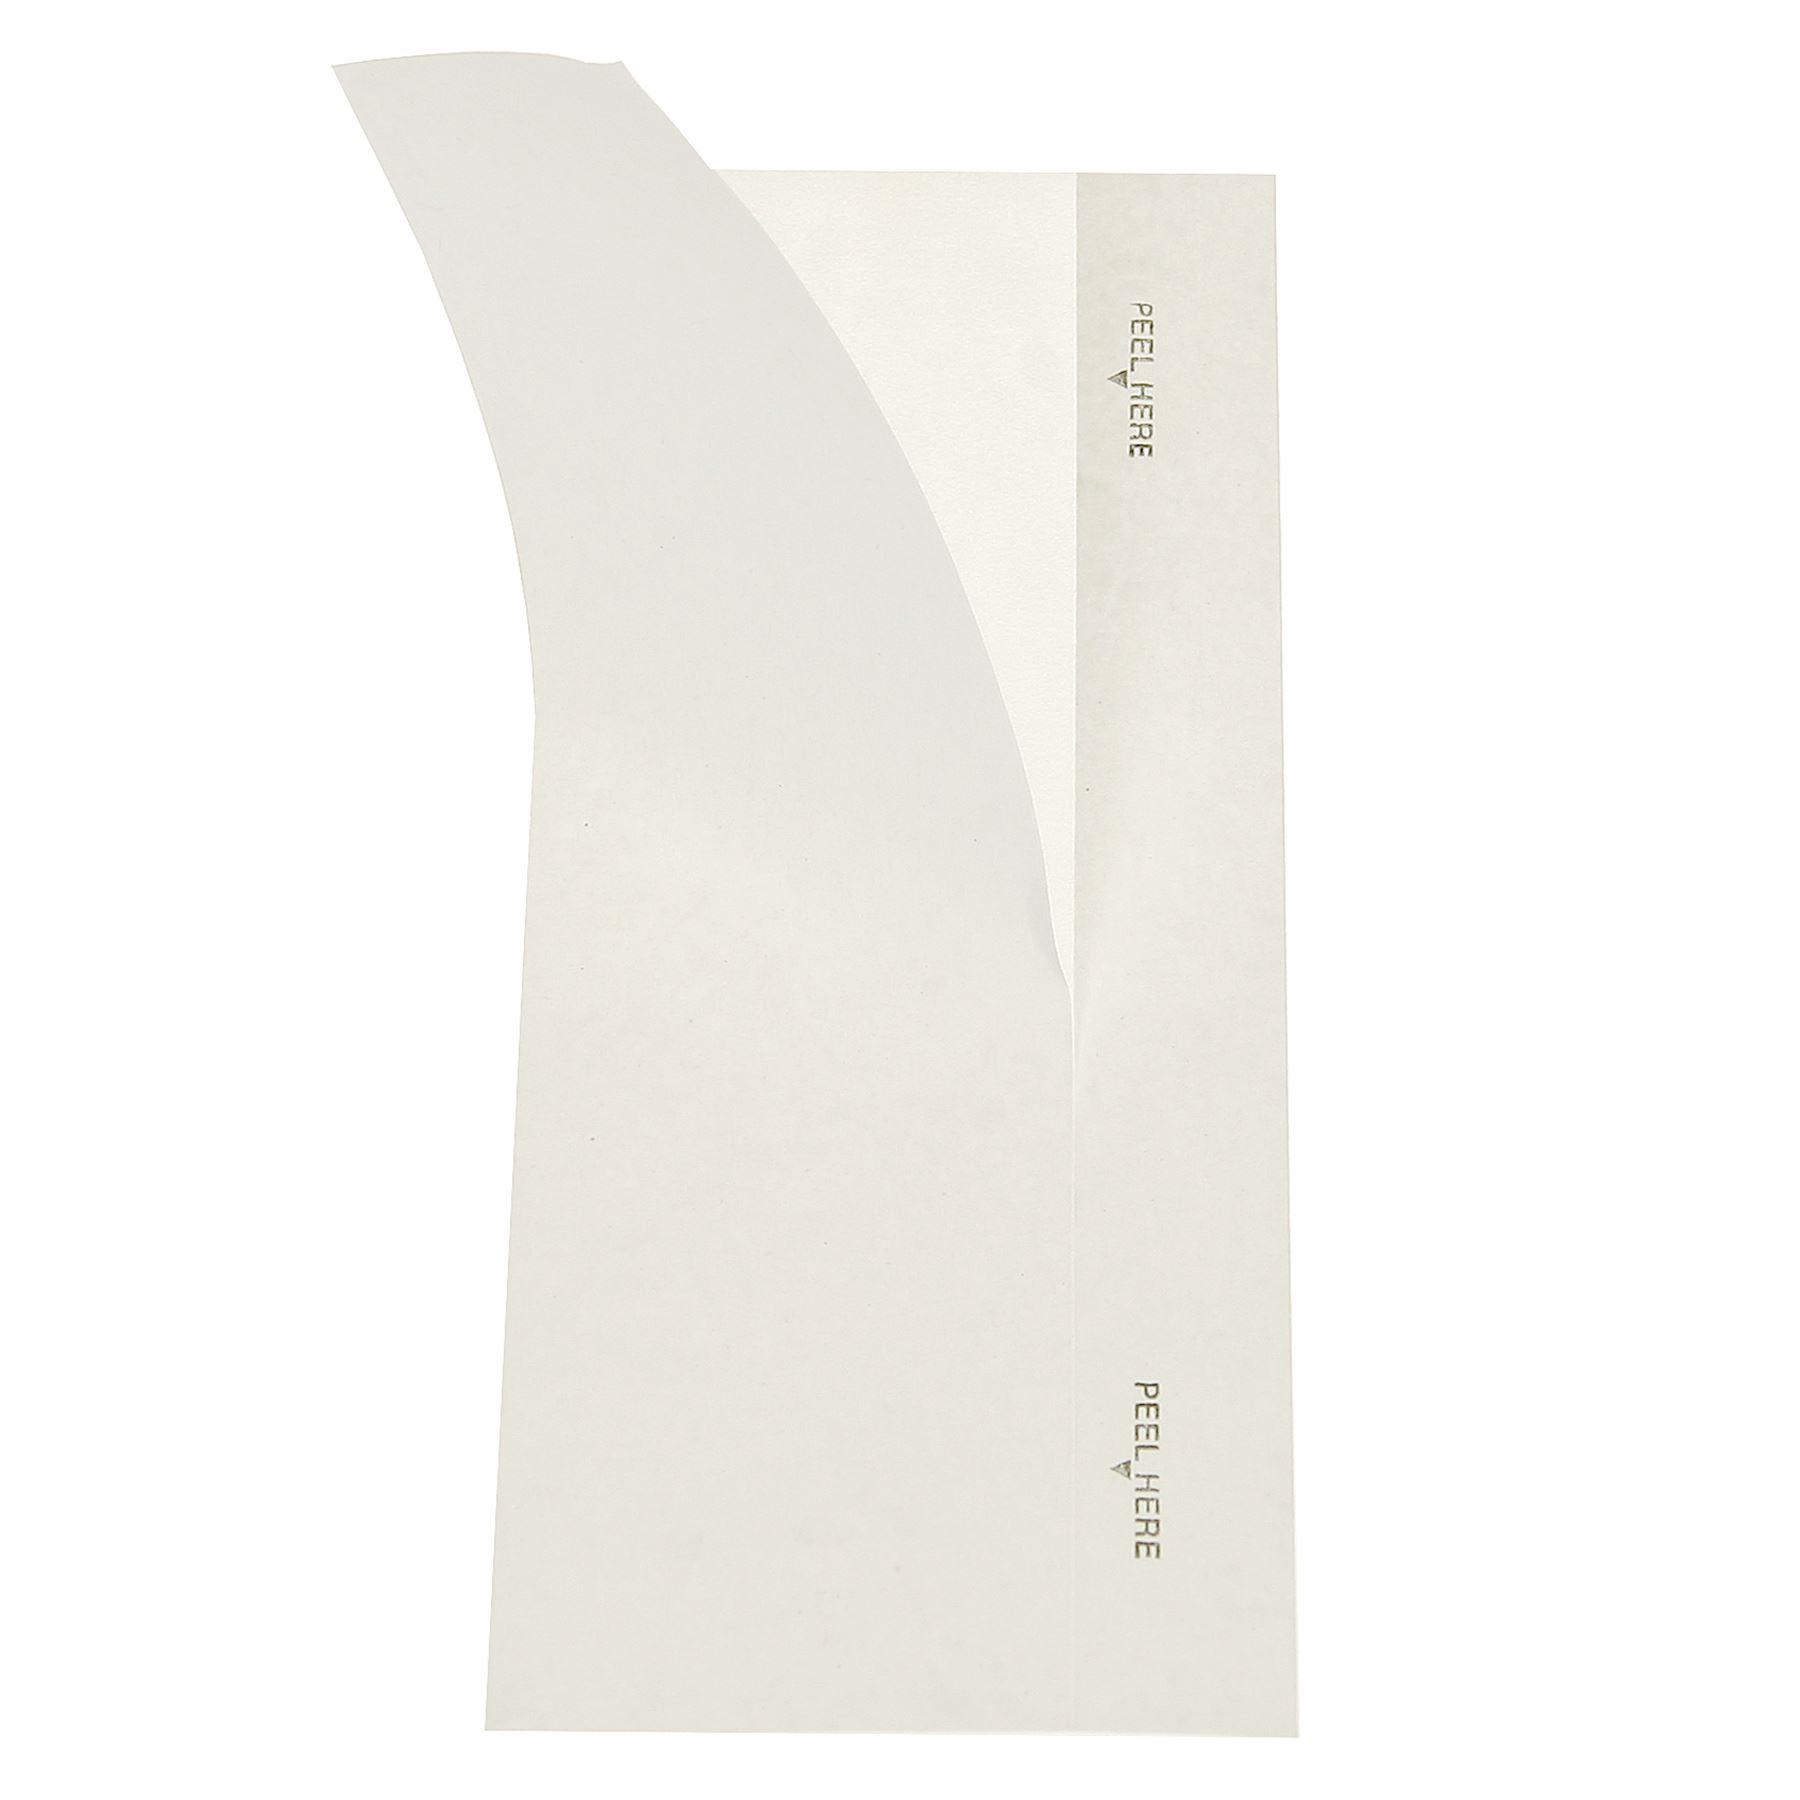 For FP 1000 Single FP Franking Labels Francotyp Postalia Model Frankers